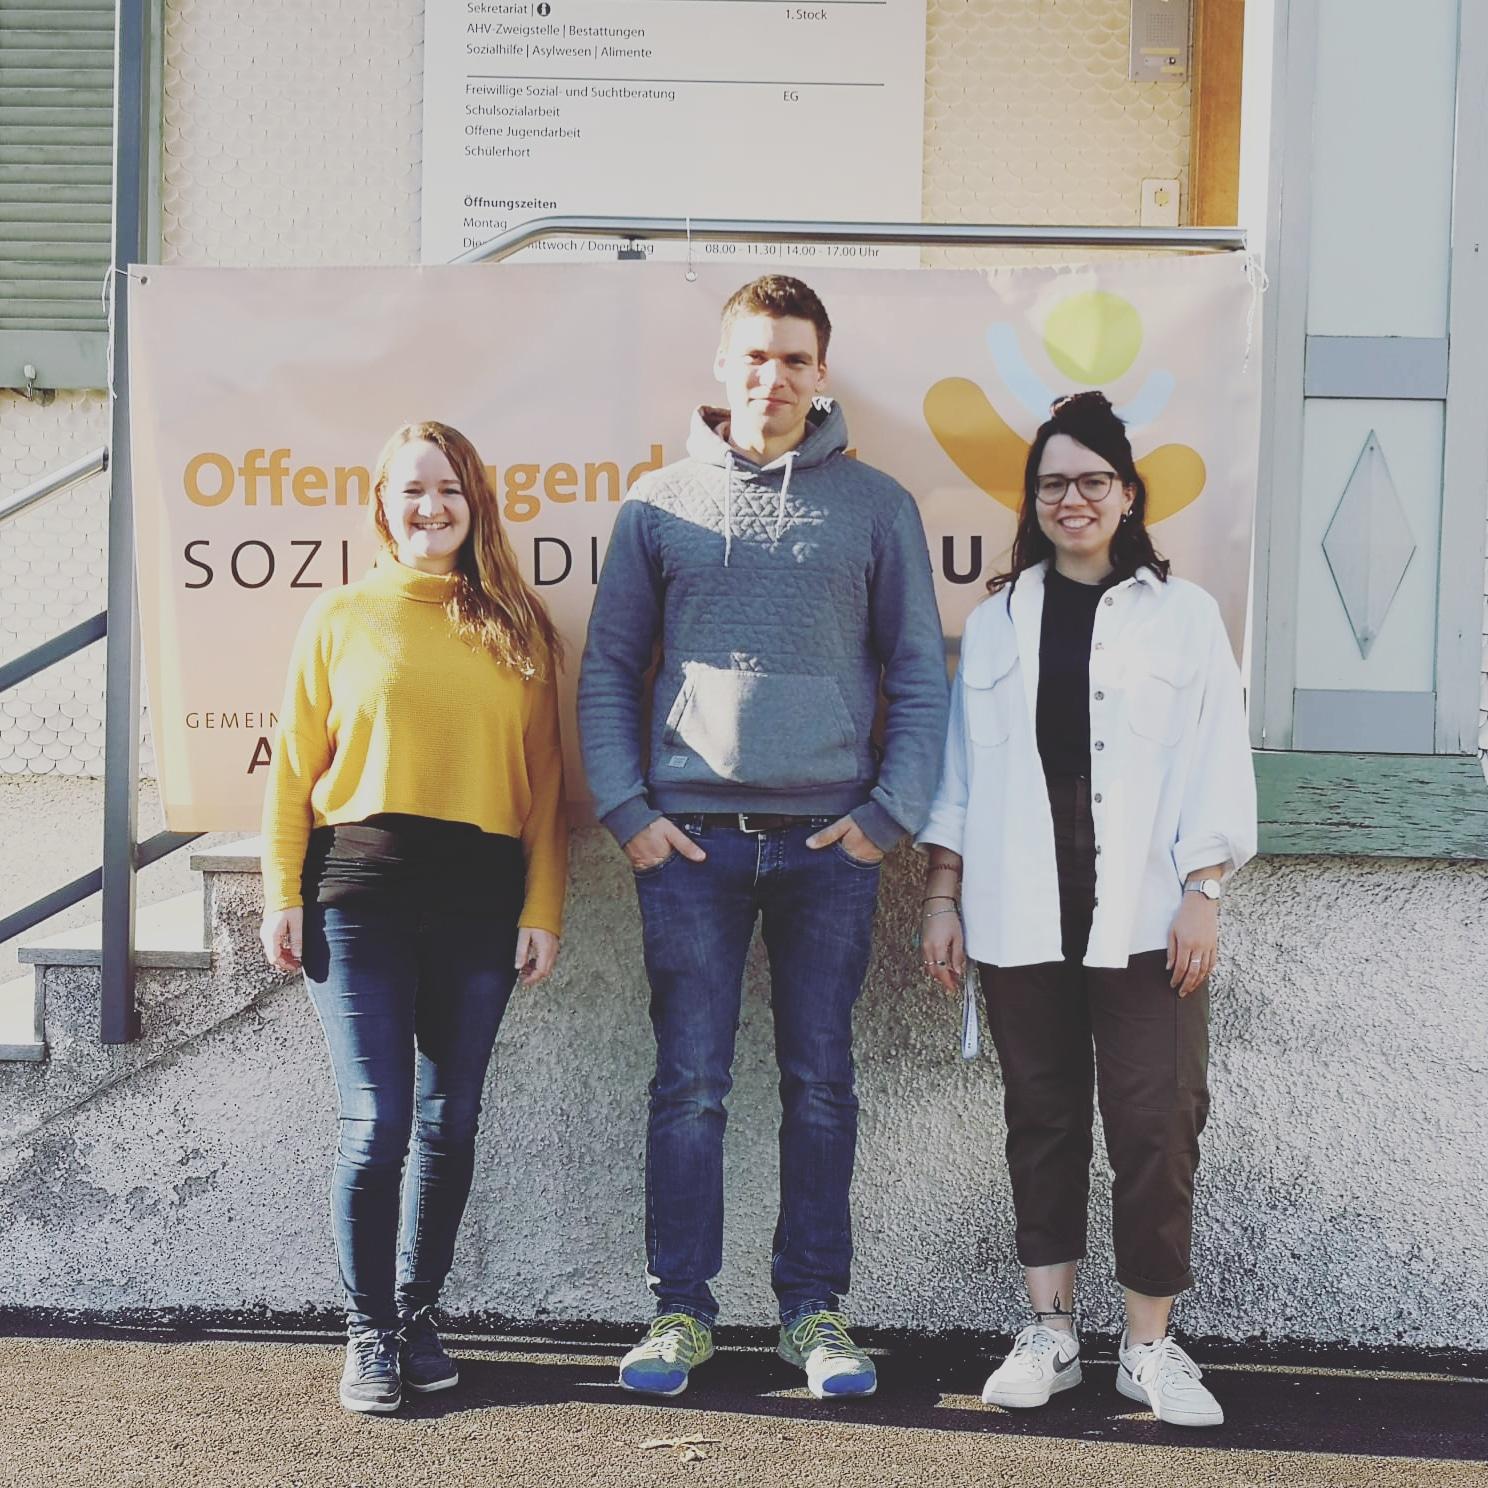 Team Offene Jugendarbeit: Daniela Benz, Denise Baumgartner, Nathan Bär